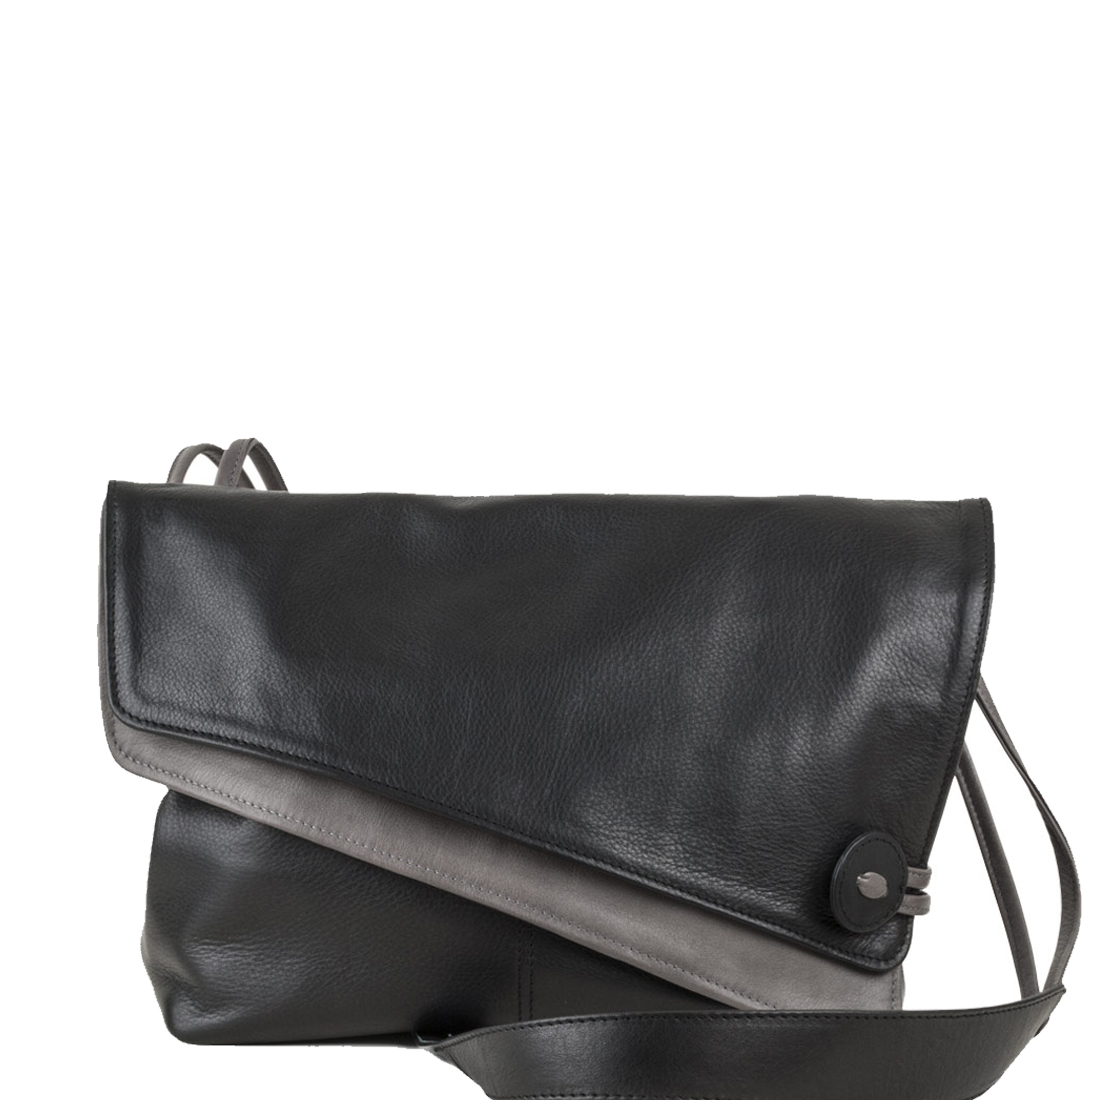 Lindsay Black Across Body Leather Bag